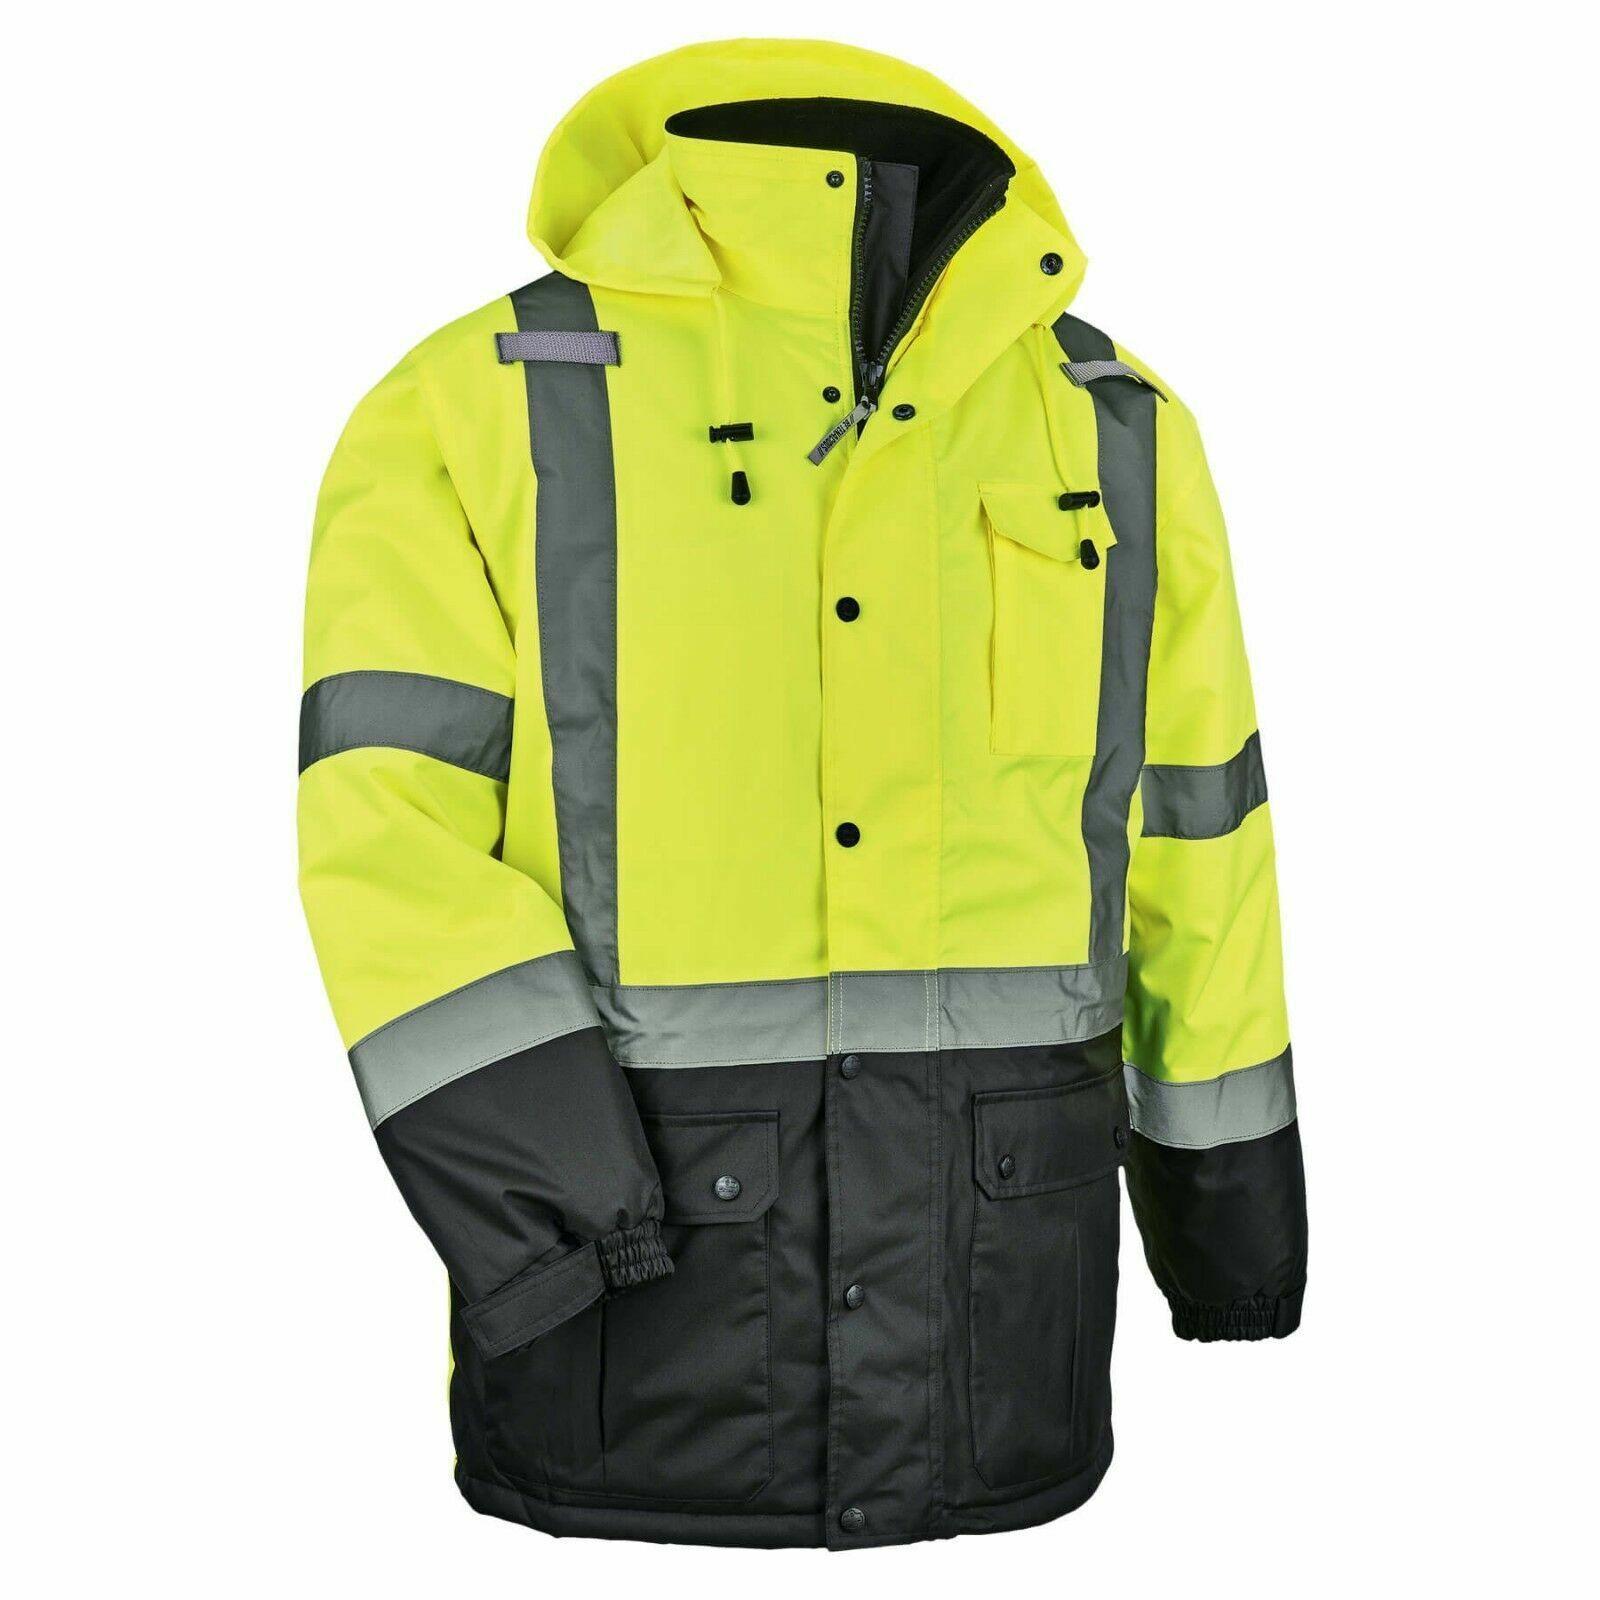 Ergodyne 8384 Glo Wear Thermal Parka Neon Lime ANSI  Class 3  Size Medium & XL Business & Industrial